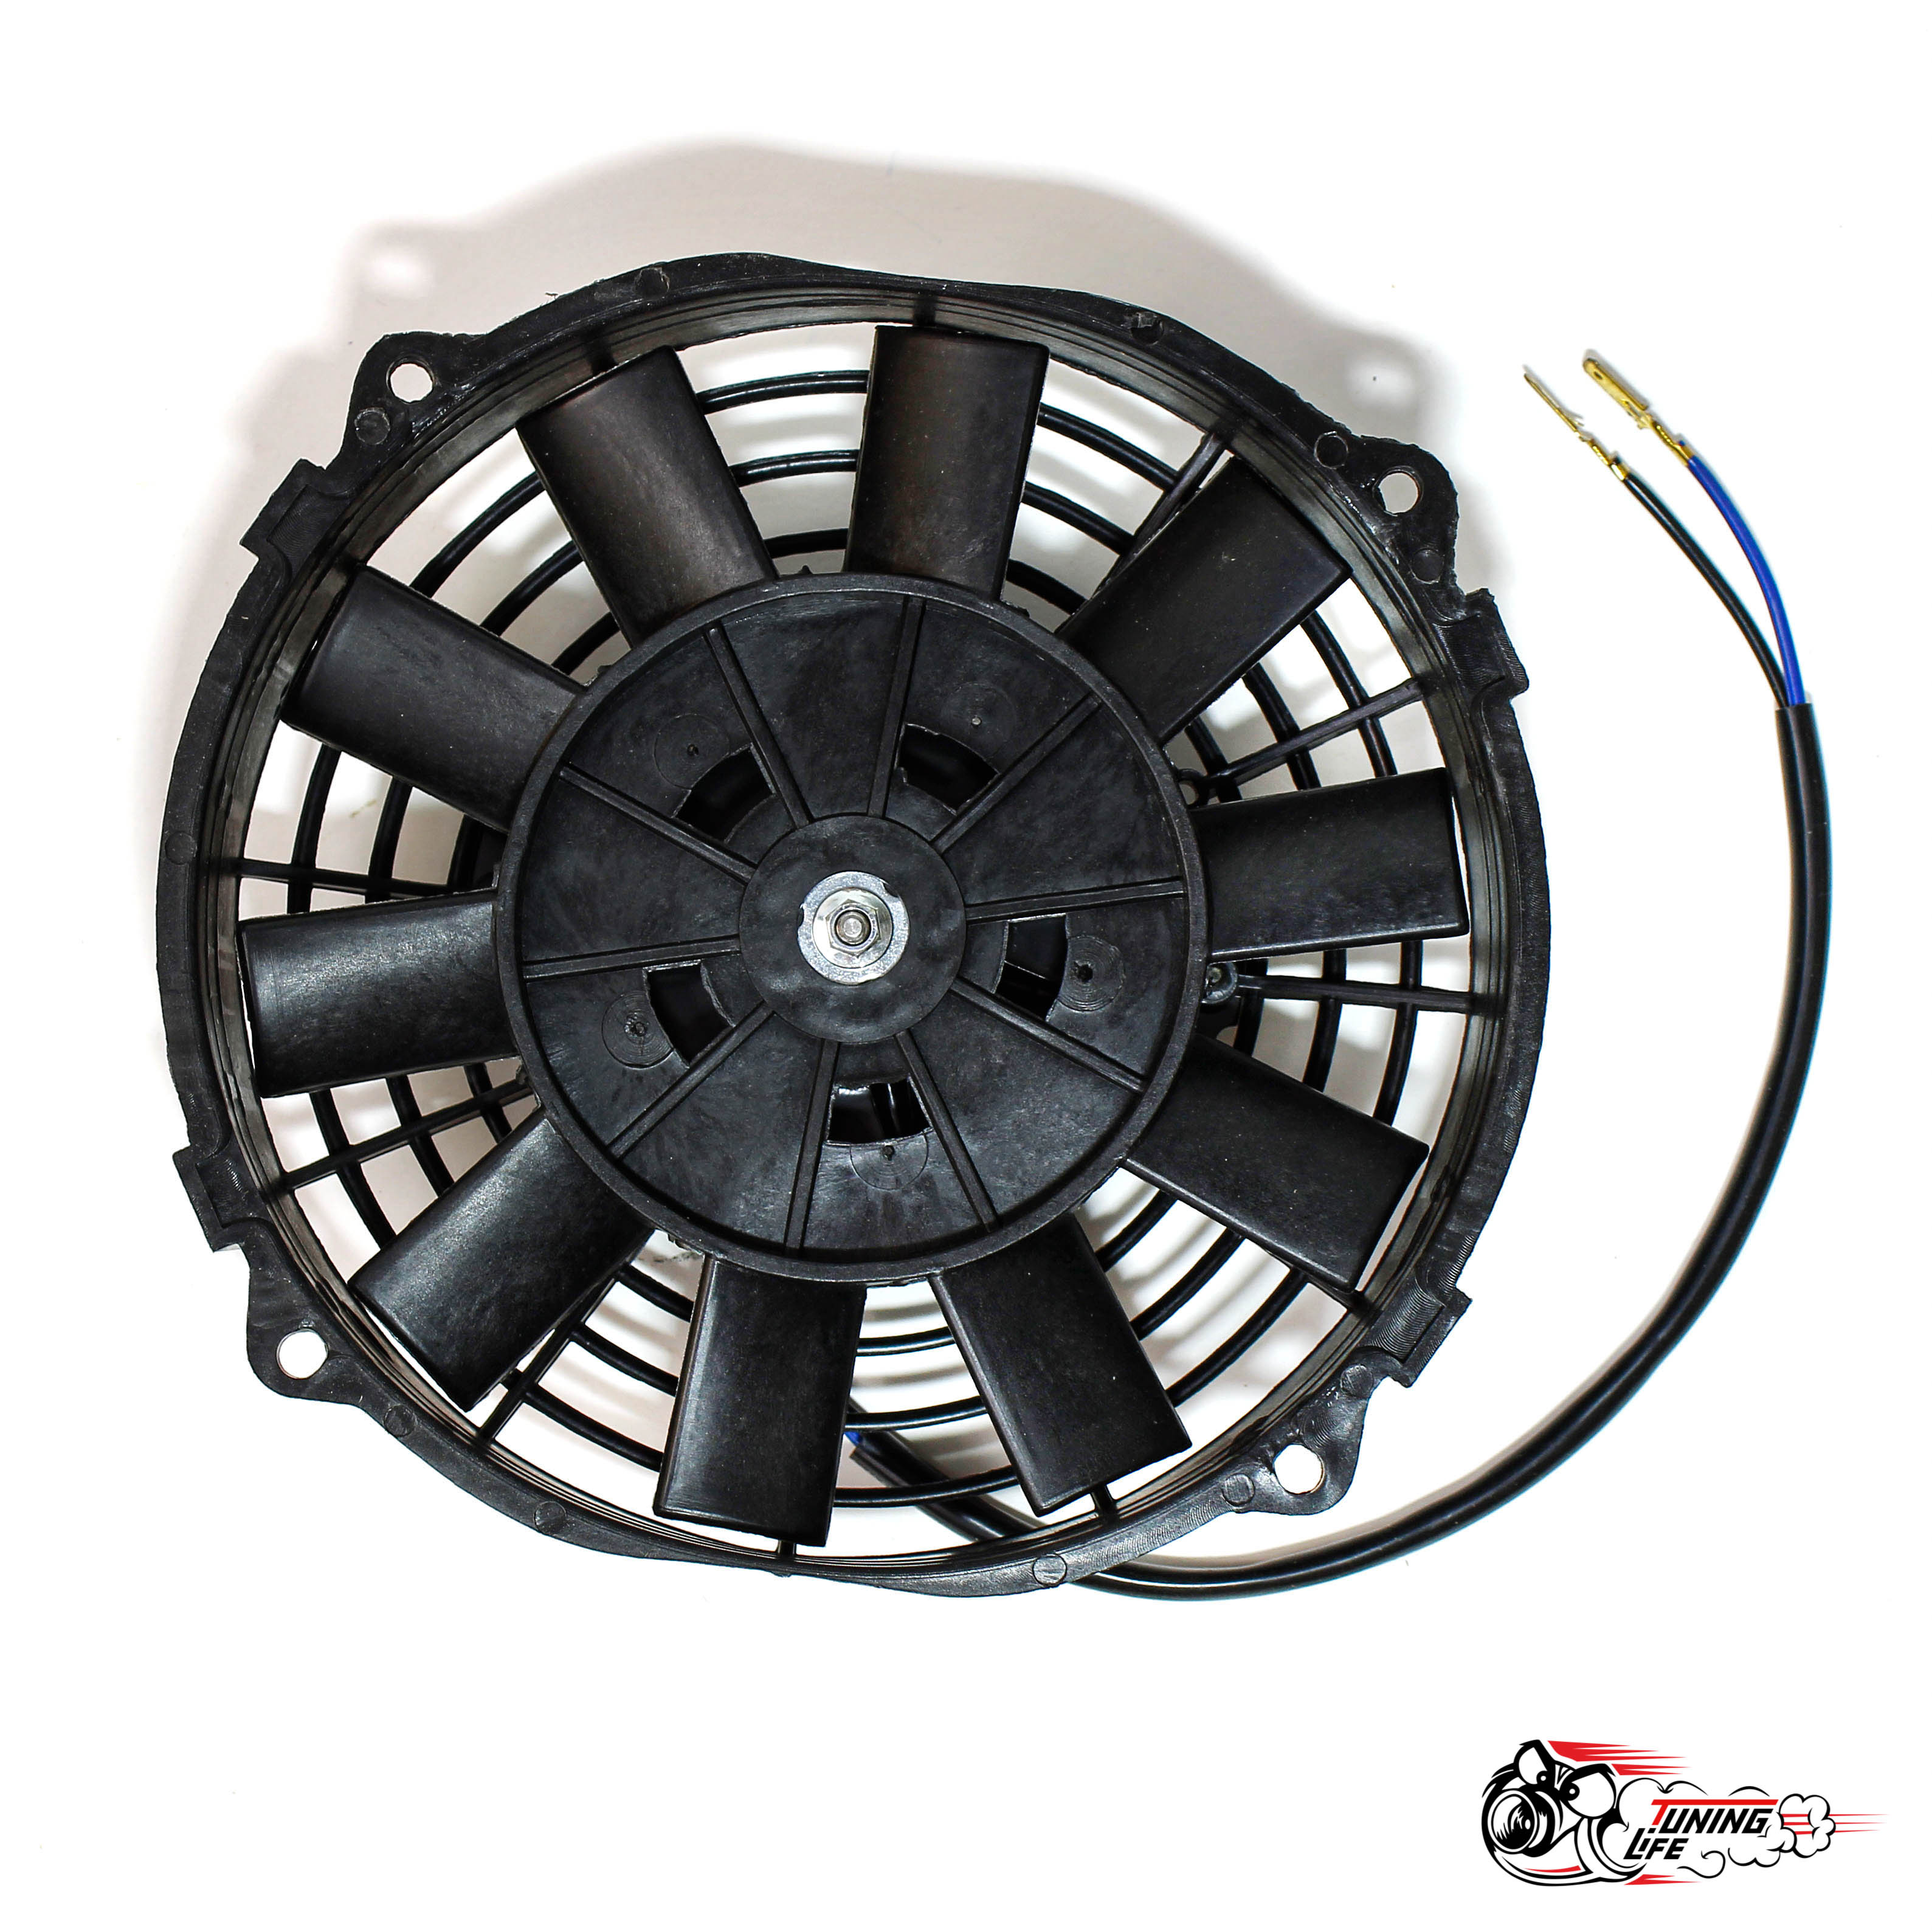 Вентилятор электрический 7 дюймов 80W